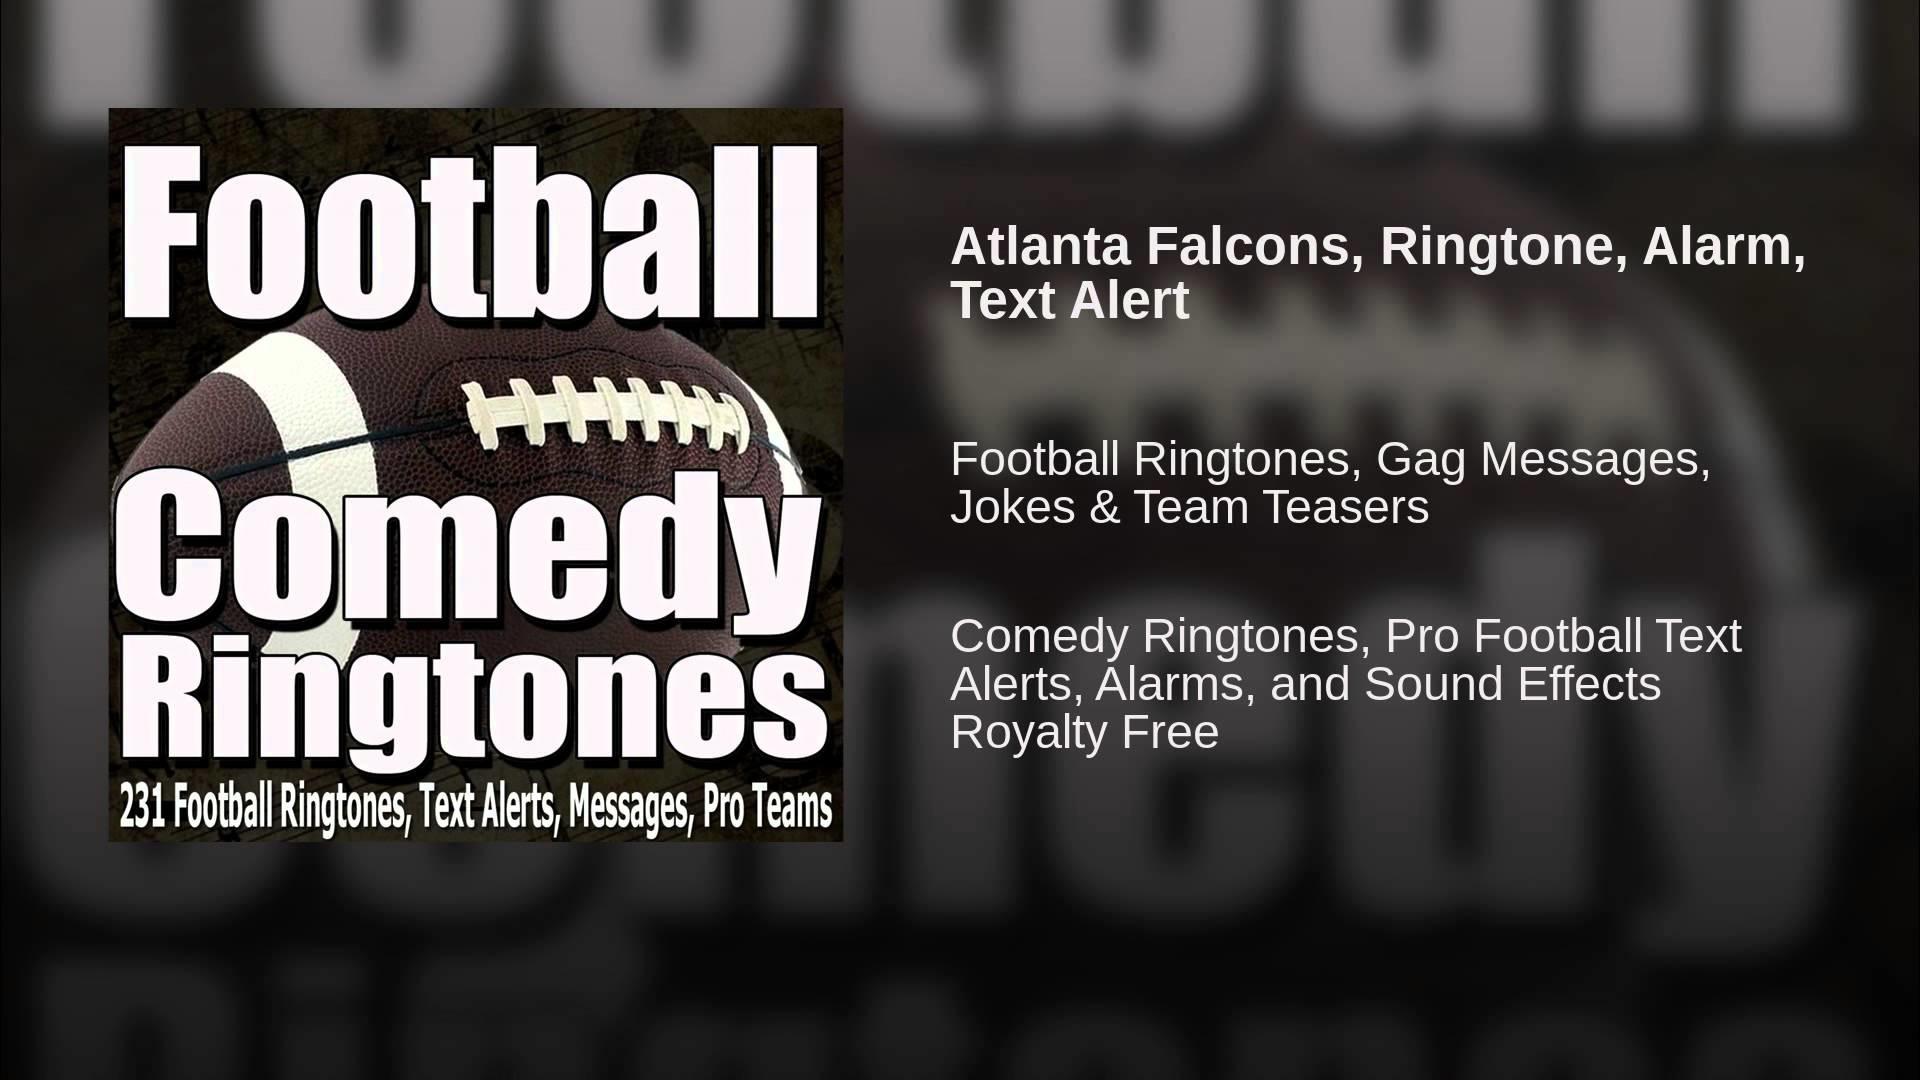 2018 Atlanta Falcons Wallpapers Pc: Atlanta Falcons 2018 Wallpaper HD (64+ Images